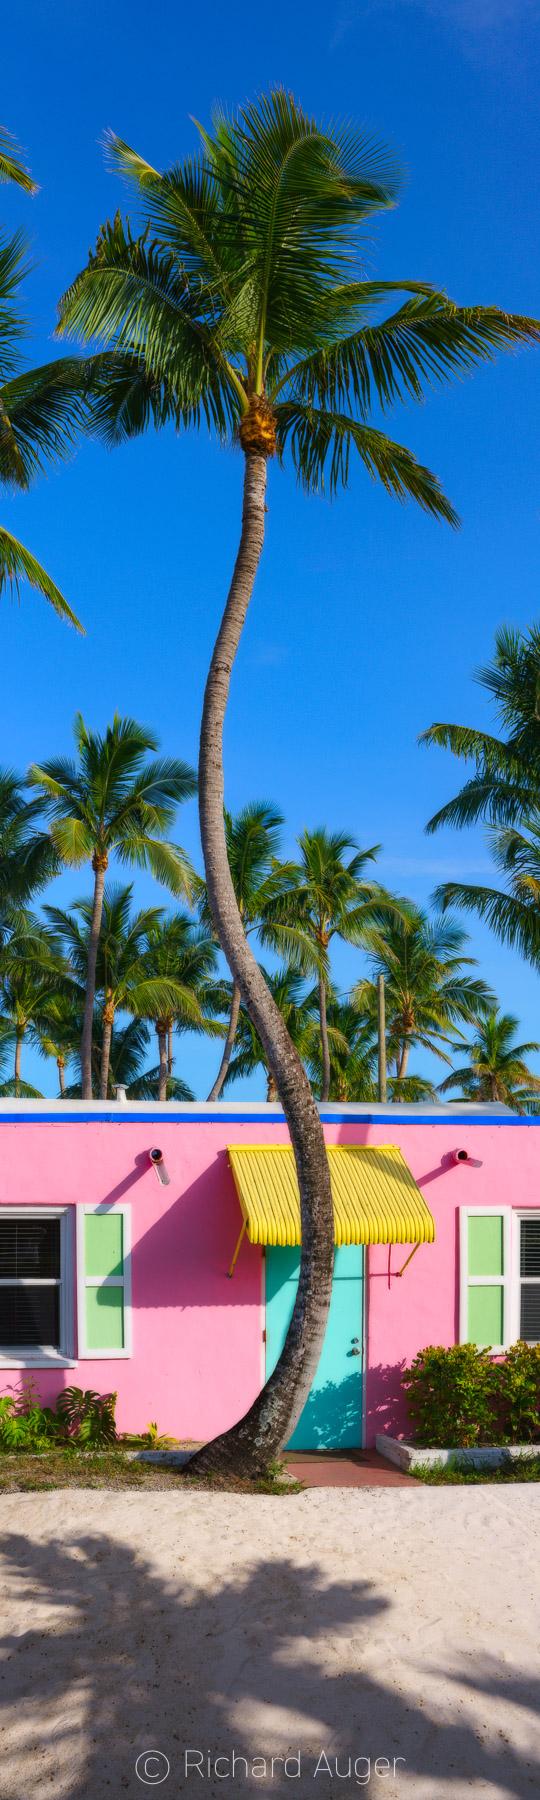 Islamorada, Florida Keys, Old Florida, Hotel, Pink. Blues, Sand, Palm Trees, Sky, Vertical Panorama, Photograph, Photographer